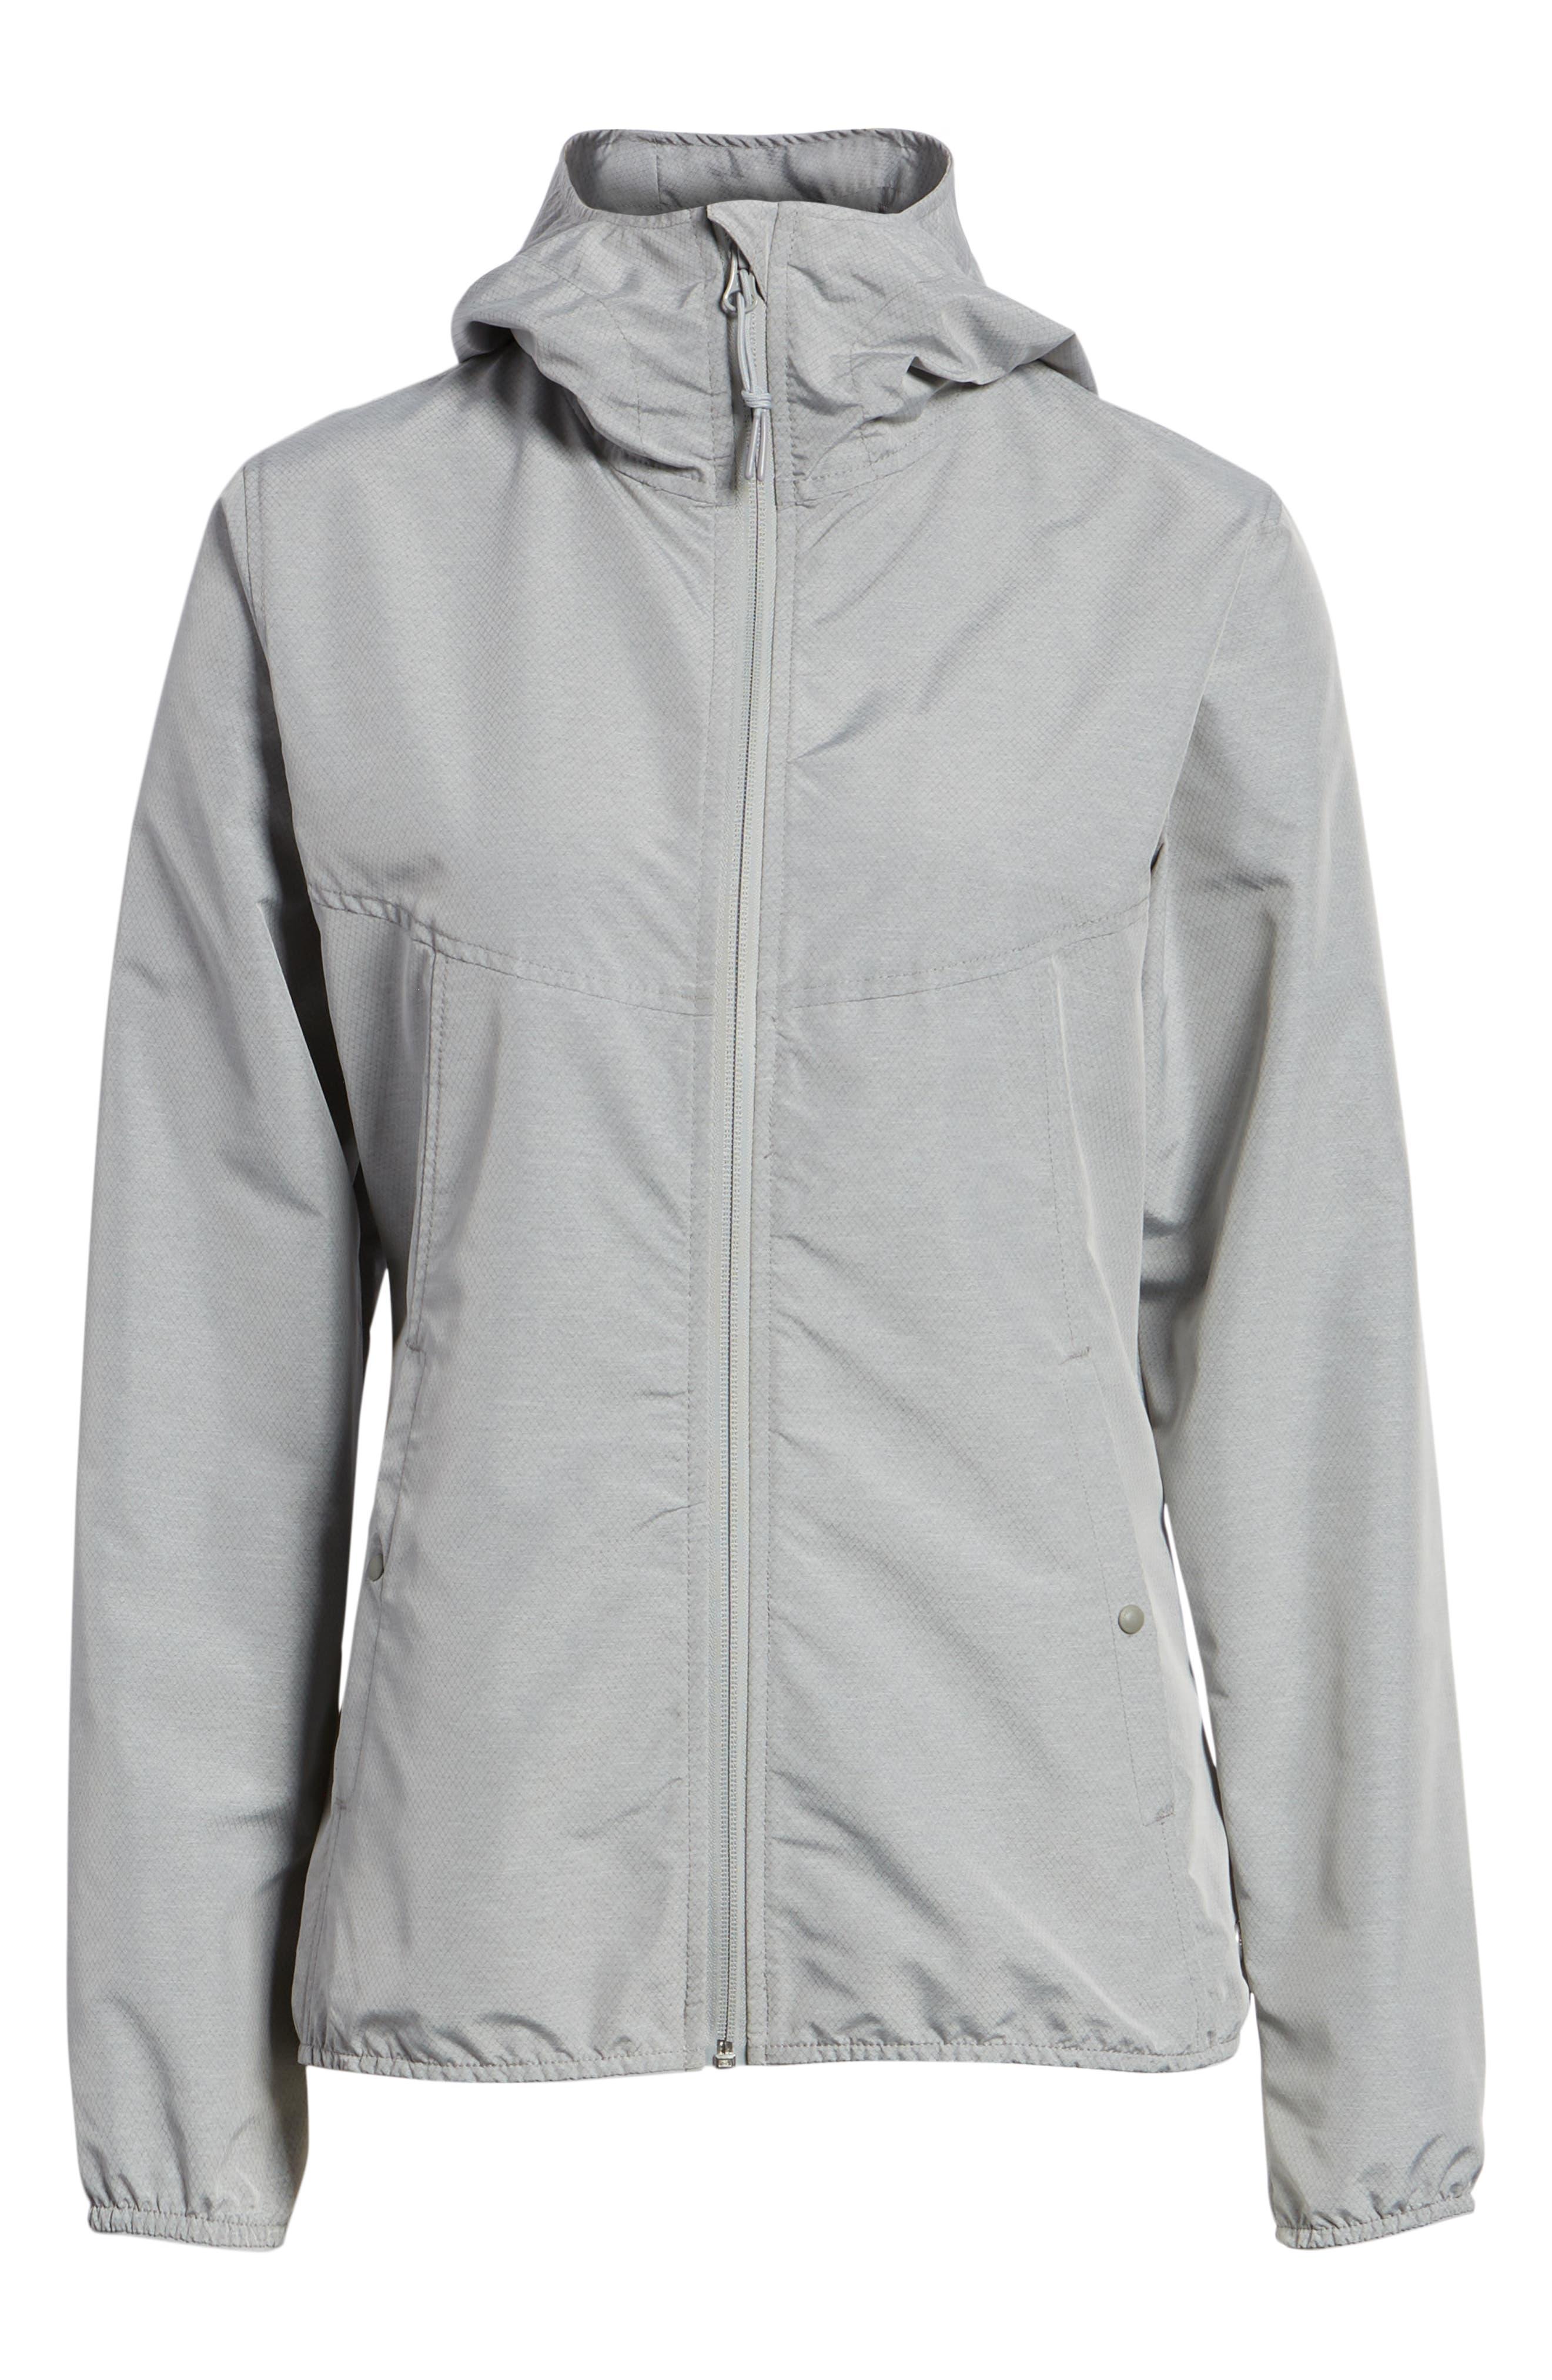 oyage Wind Hooded Jacket,                             Alternate thumbnail 6, color,                             LIGHT GREY CROSSHATCH